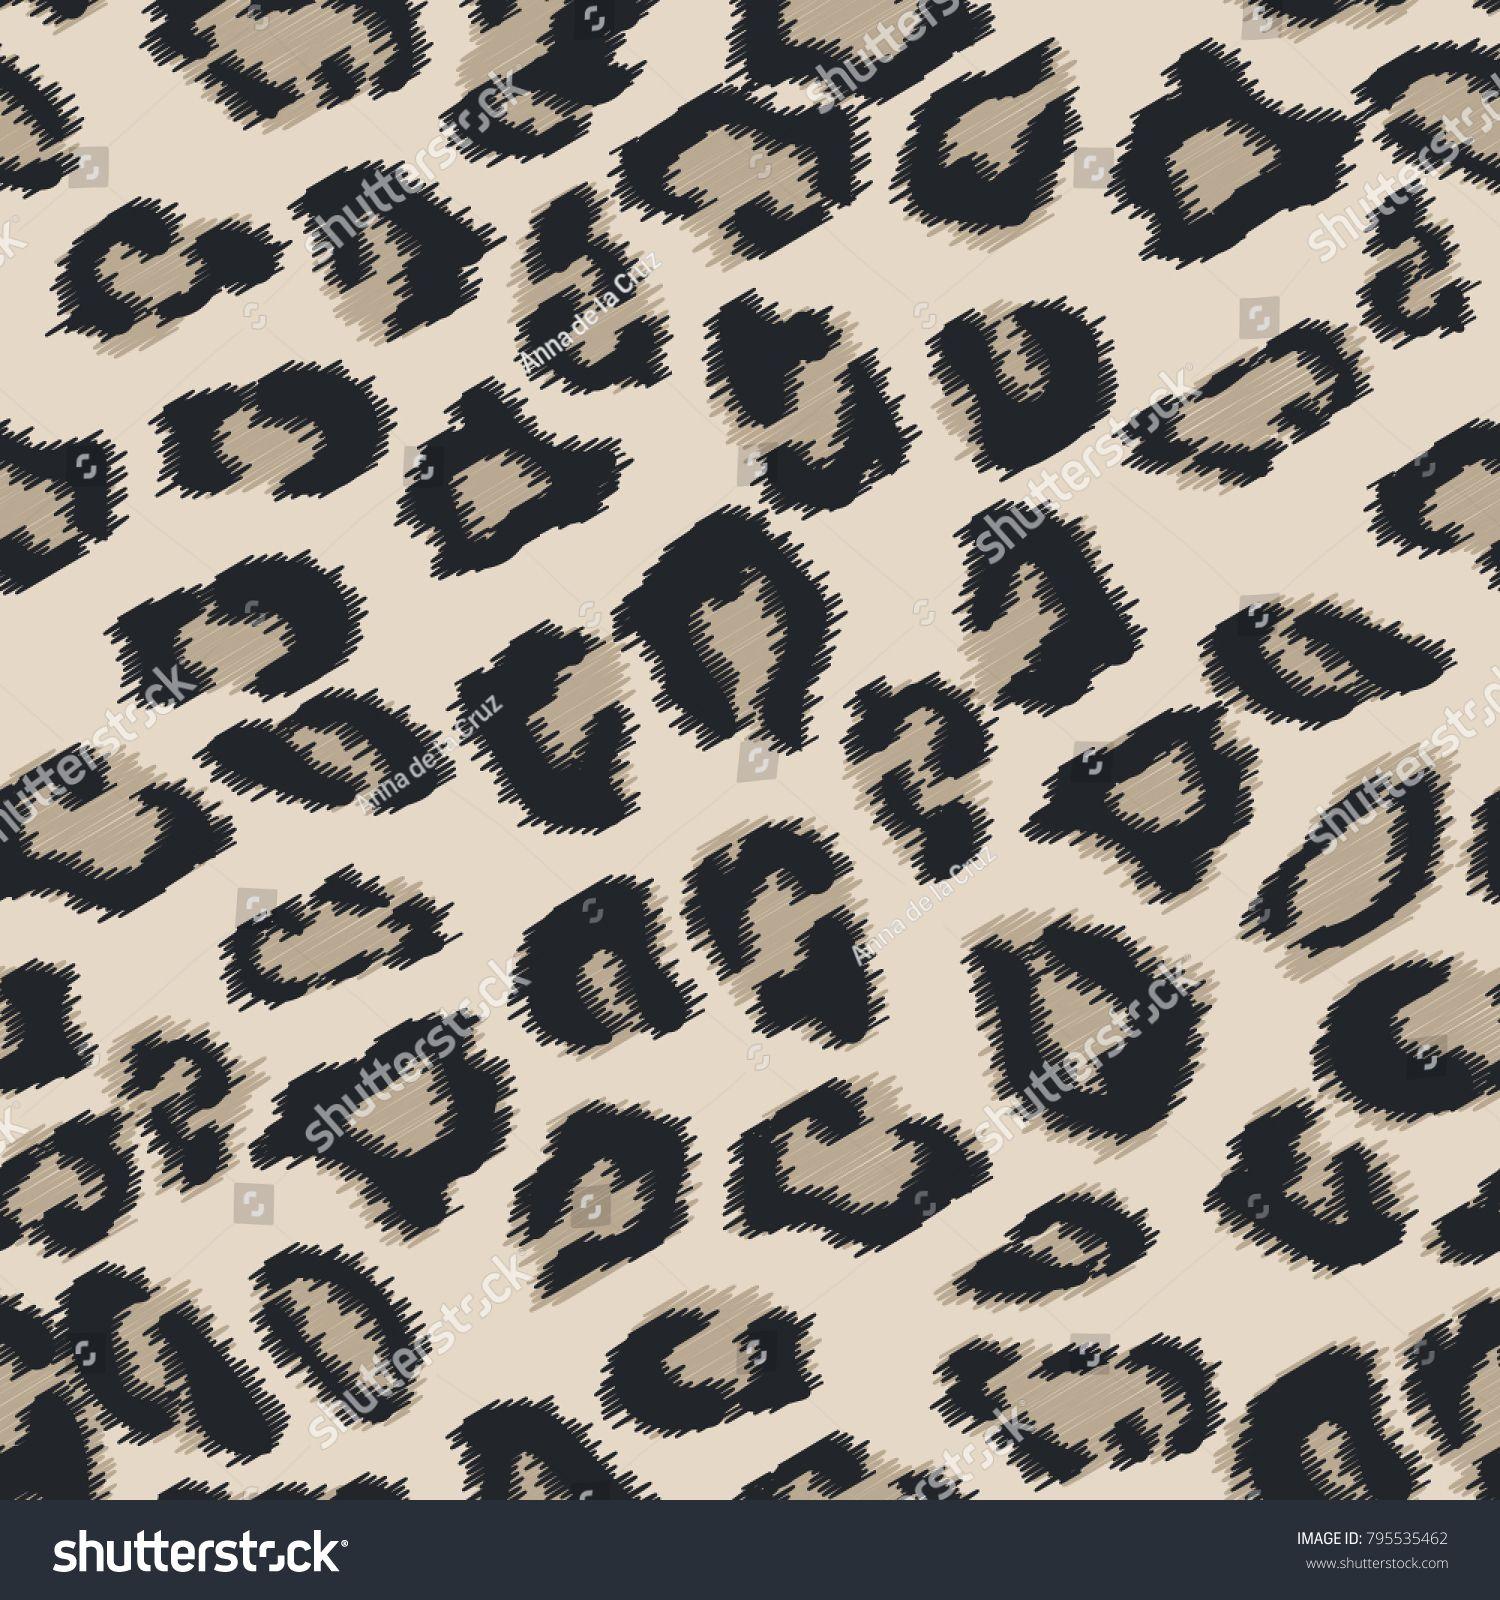 1500x1600 Seamless Leather Texture. Cheetah Fur Texture. Snow Leopard